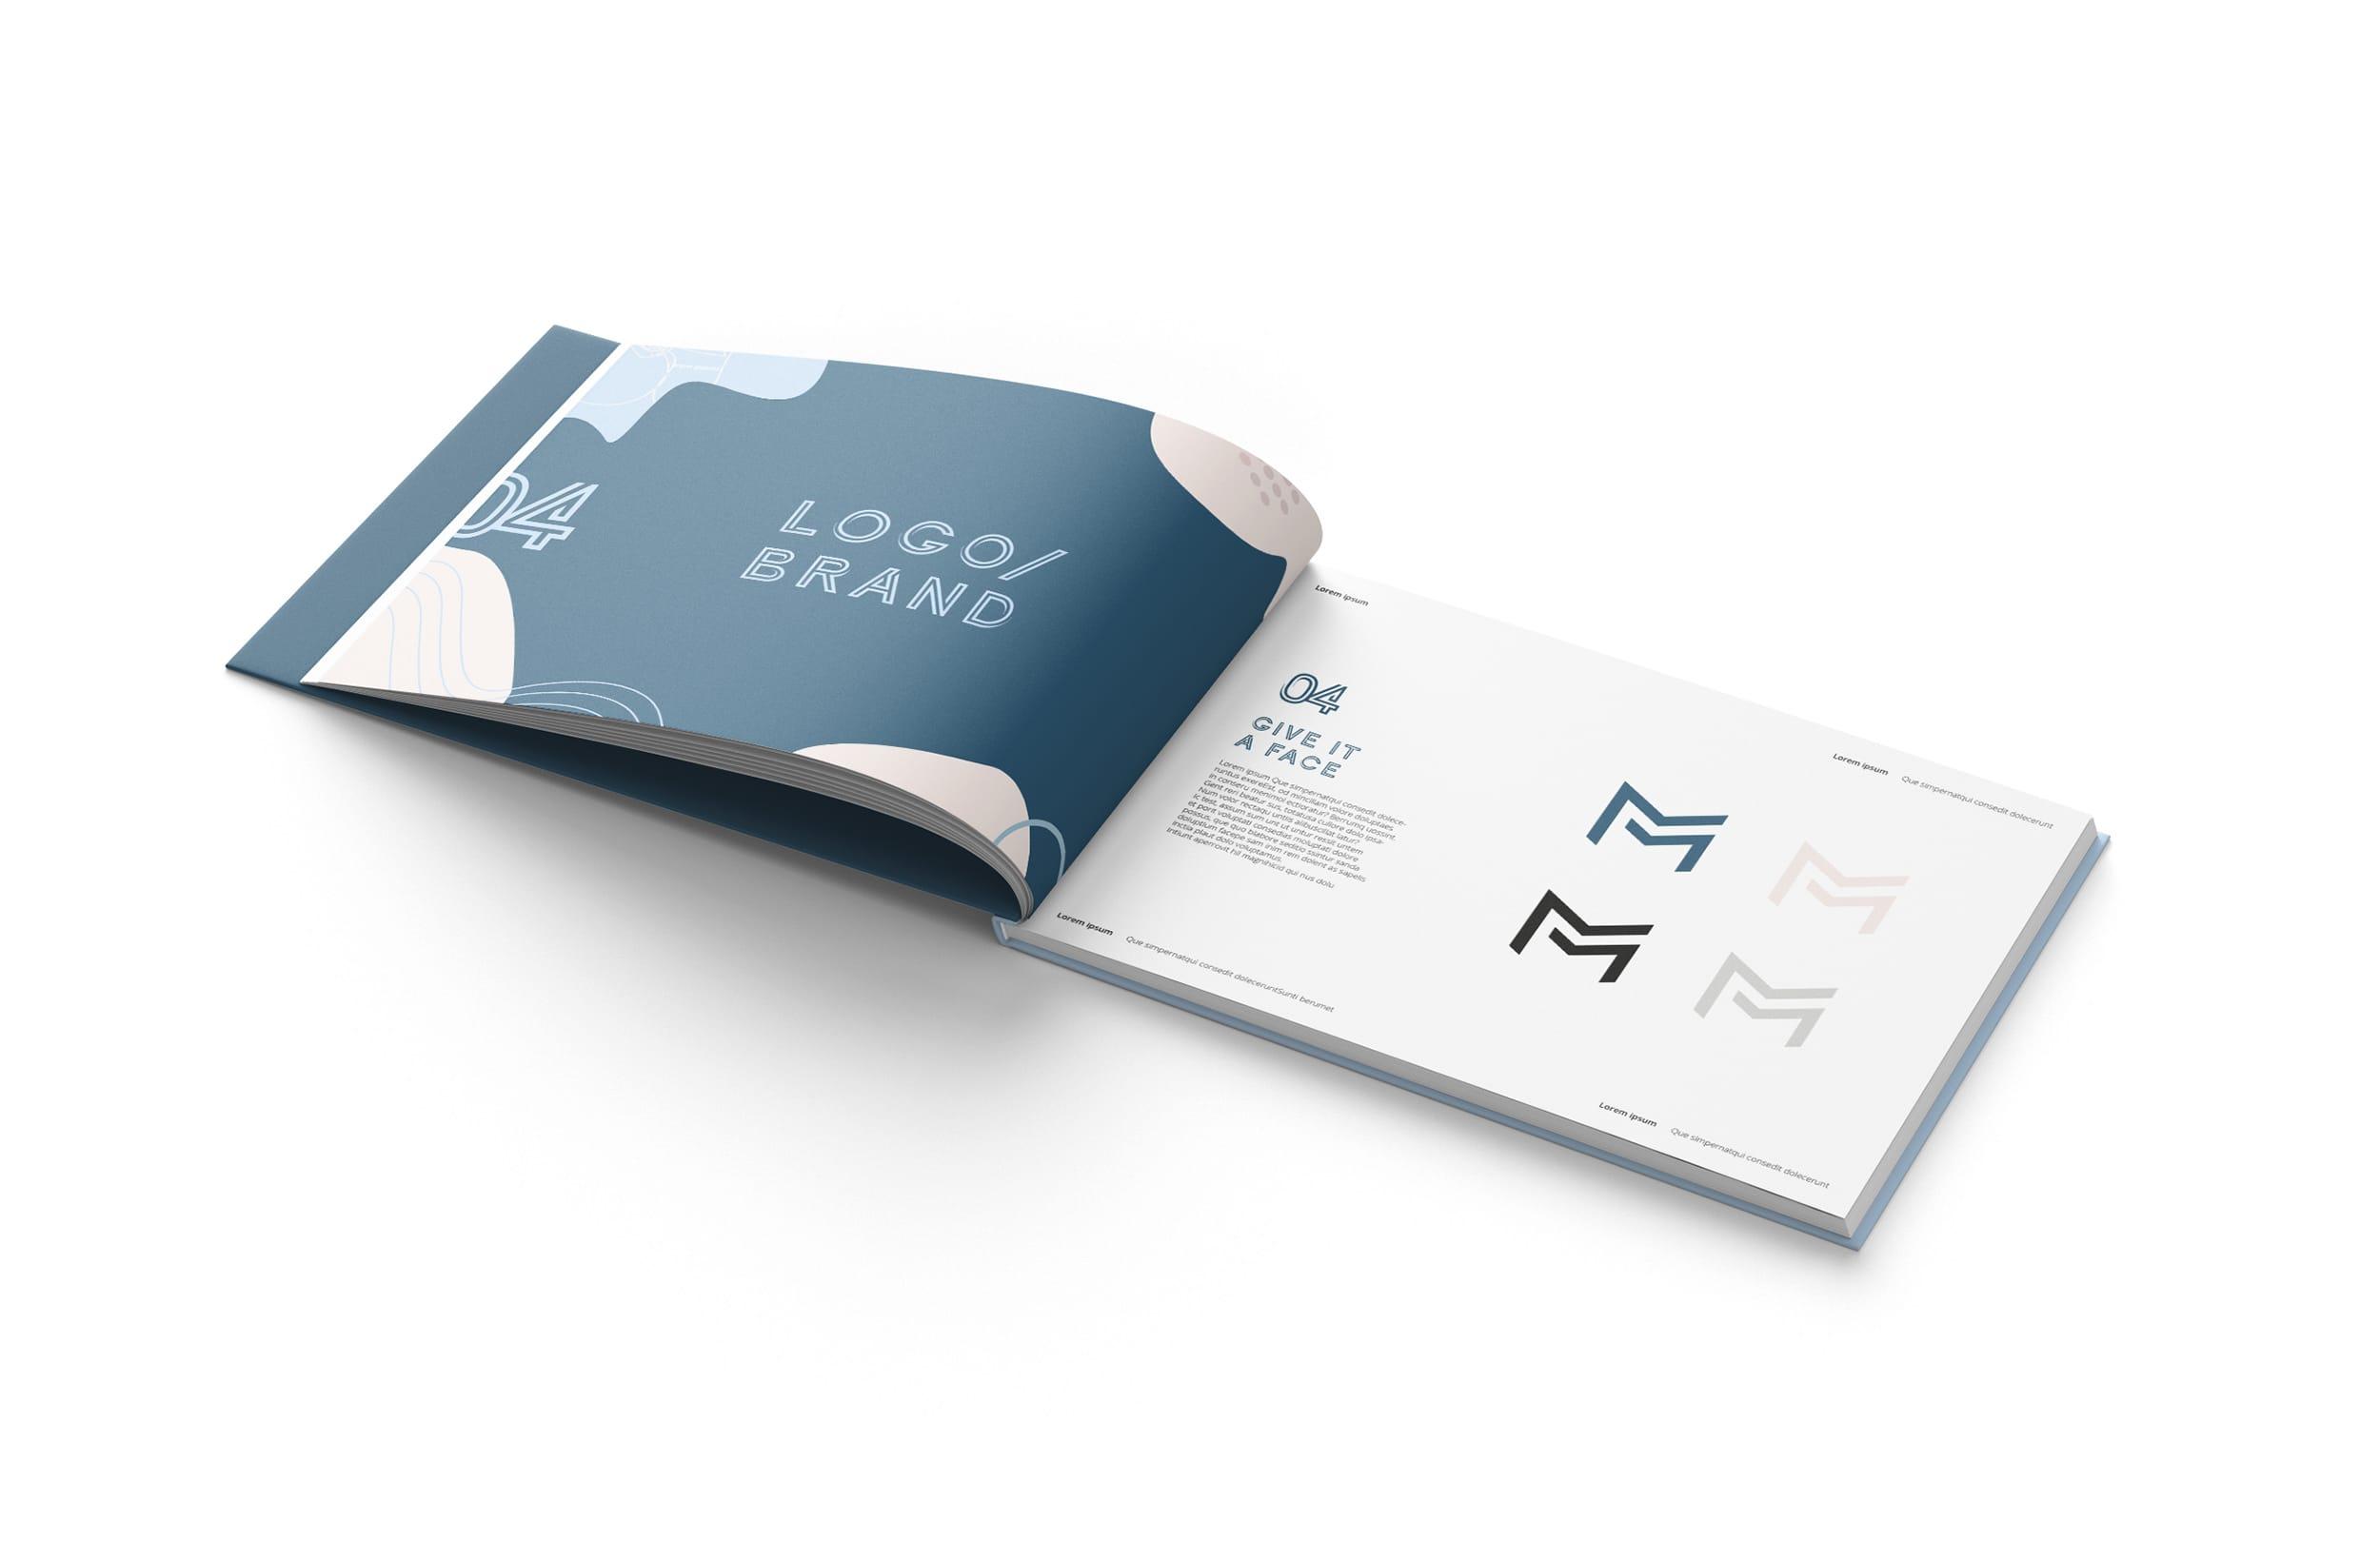 montroit-design-brand-guideline-liq-d